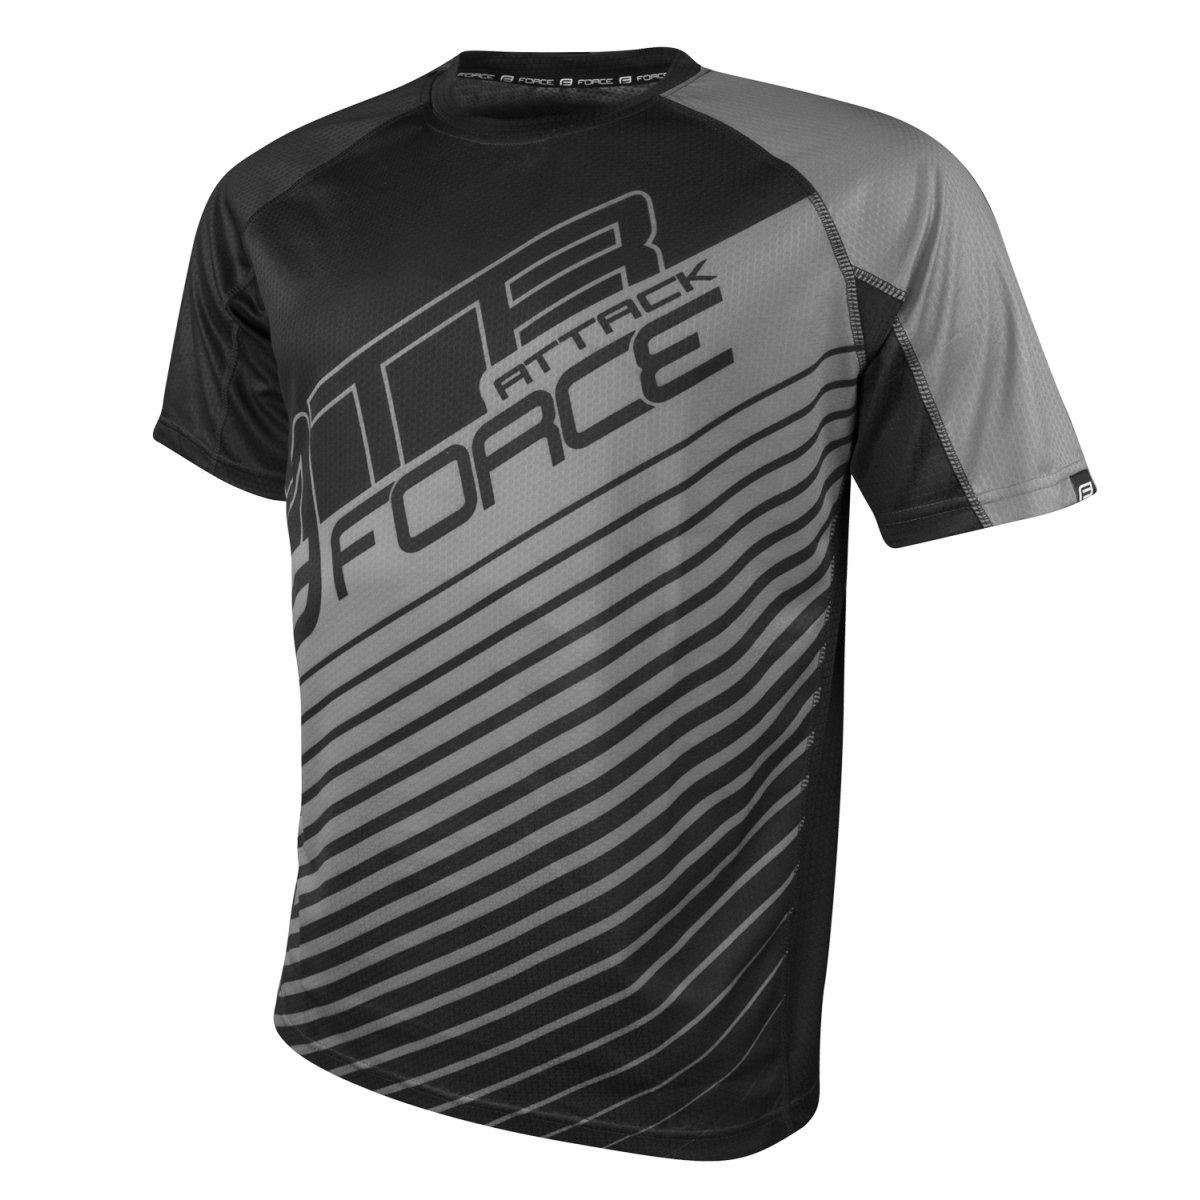 Force Attack MTB cykeltrøje sort / grå | Trøjer